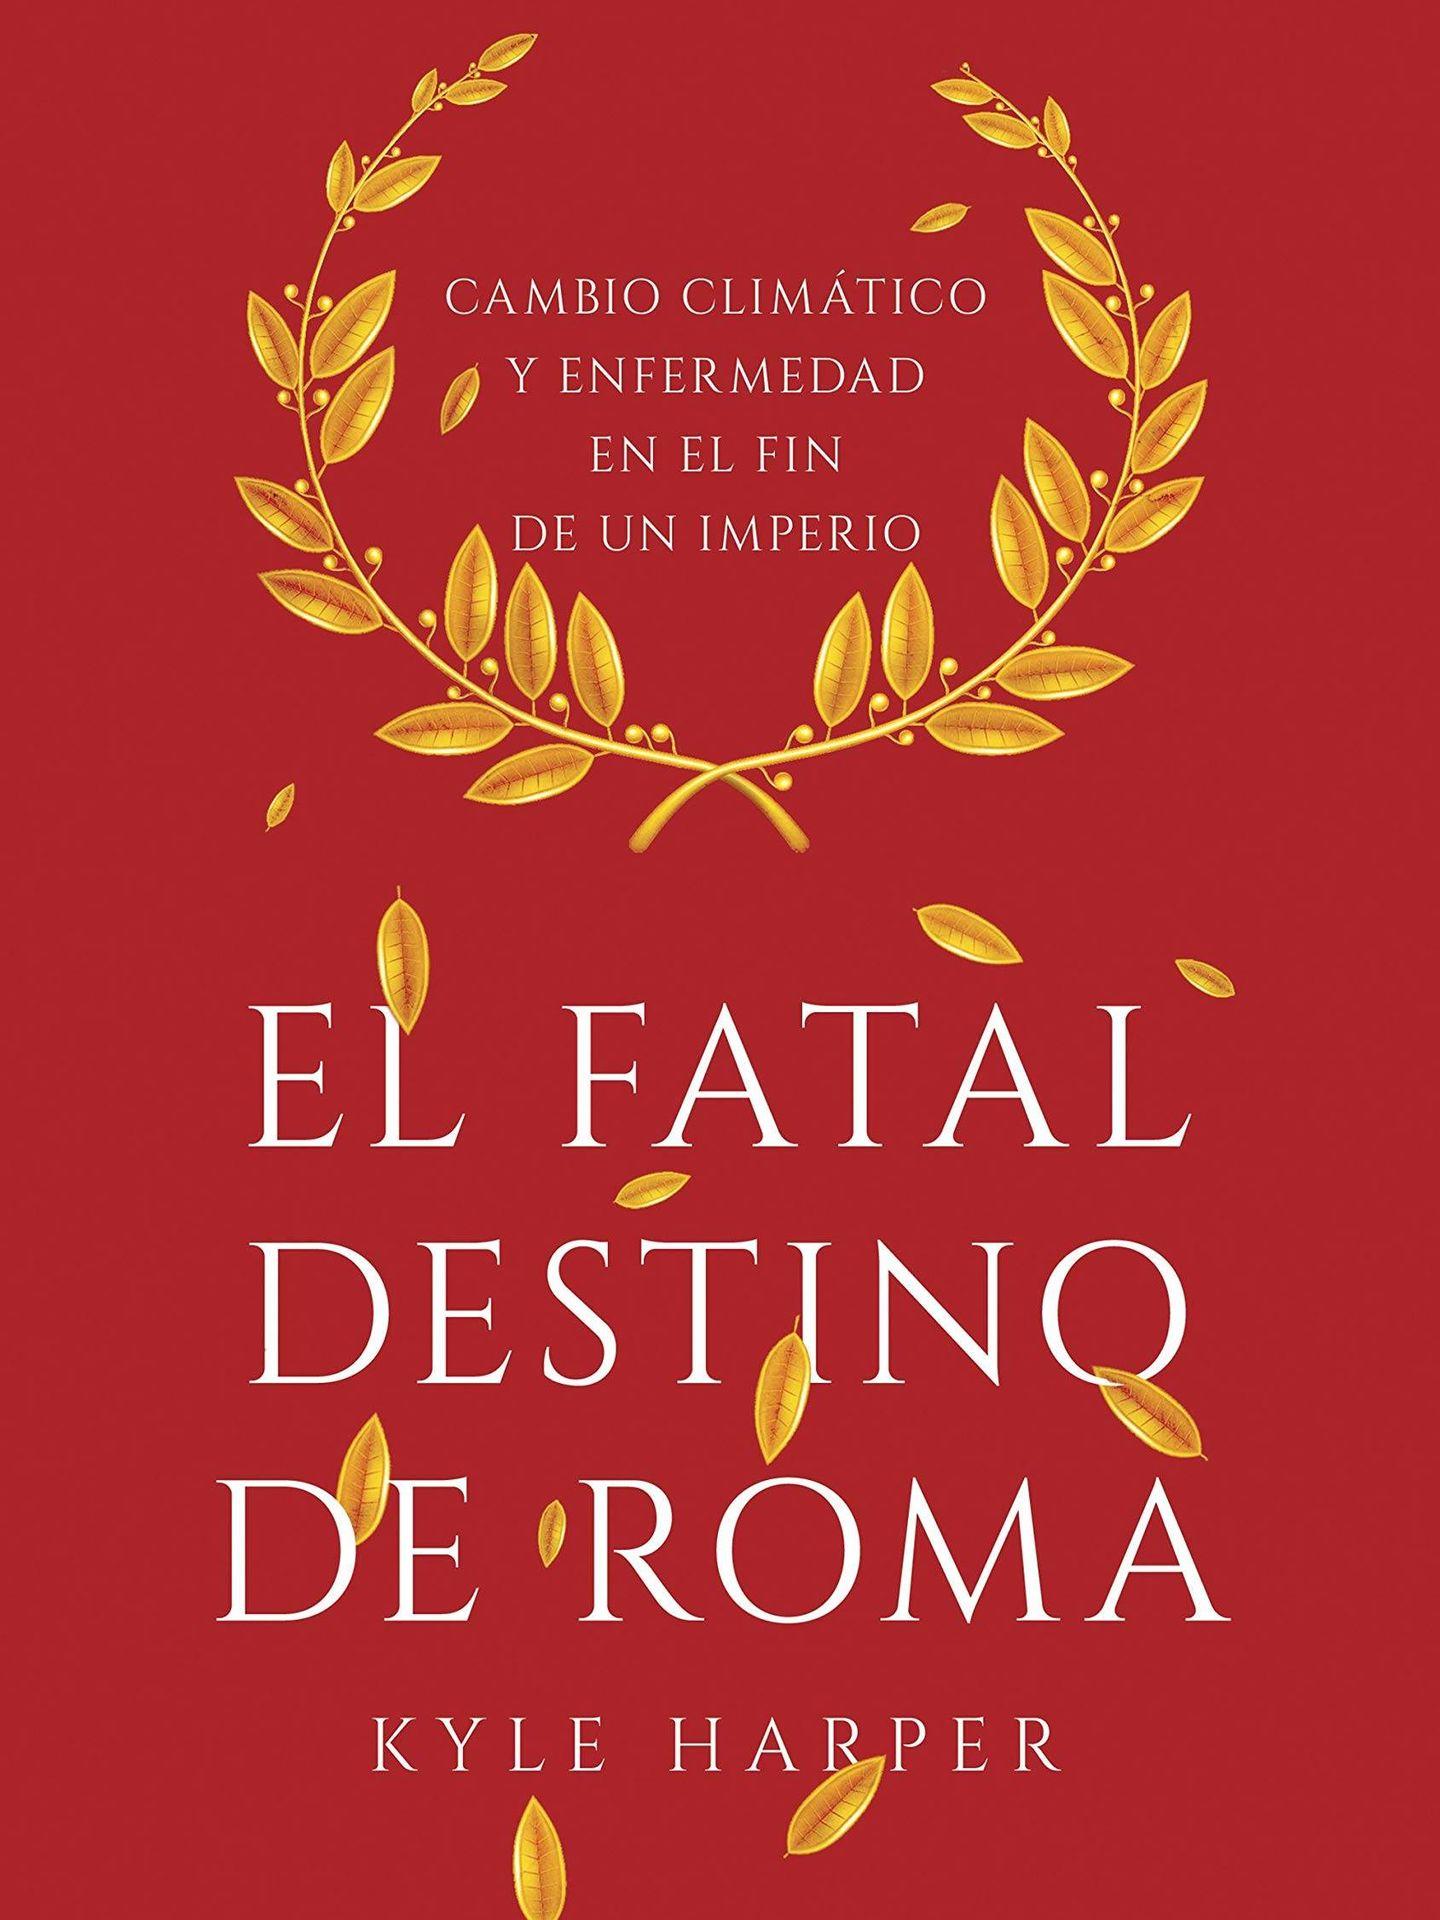 'El fatal destino de Roma' (Crítica).